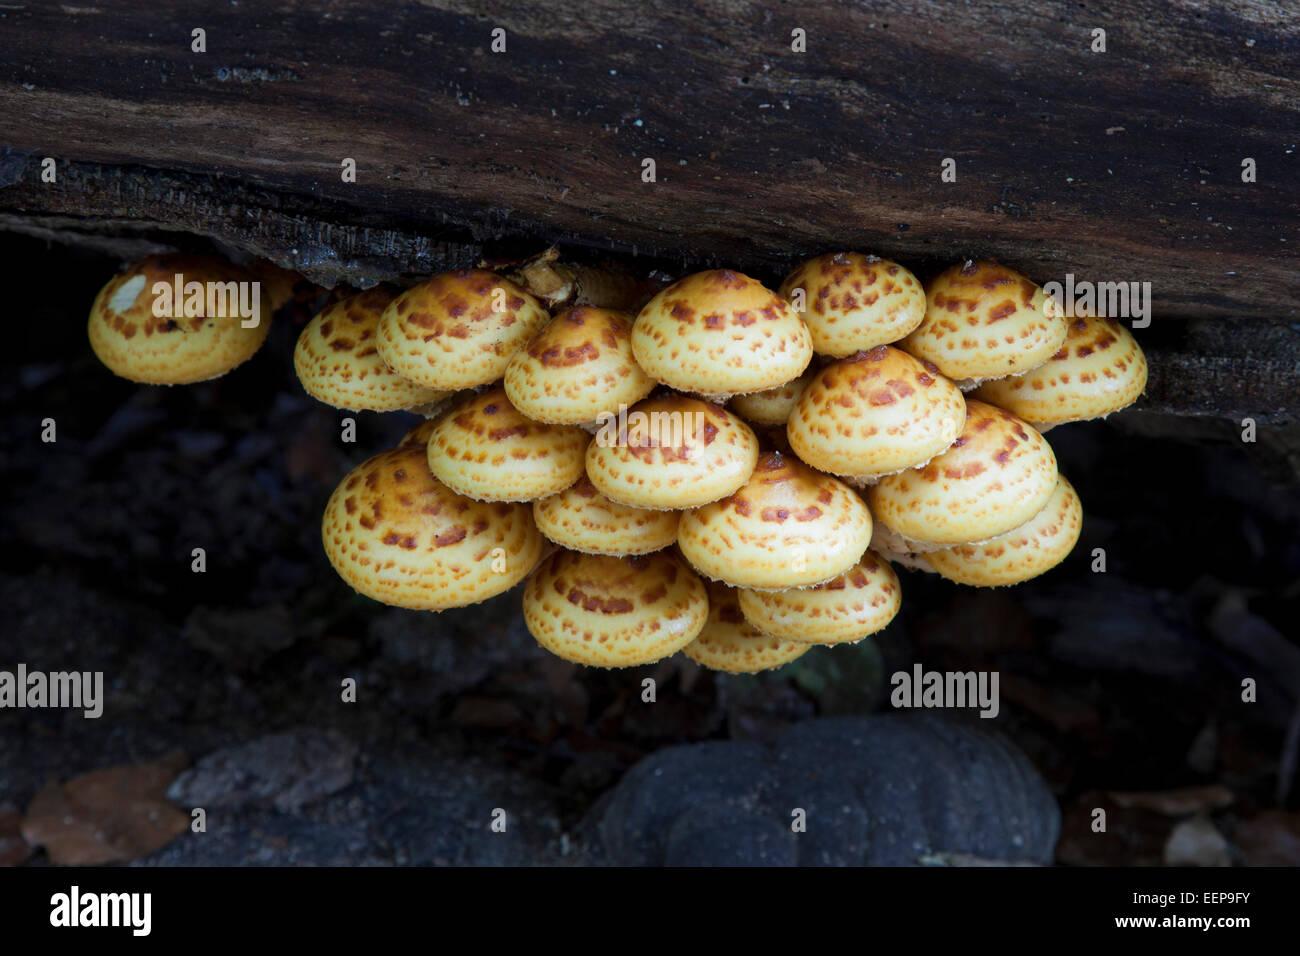 Unbekannter Pilz an Totholz - Stock Image